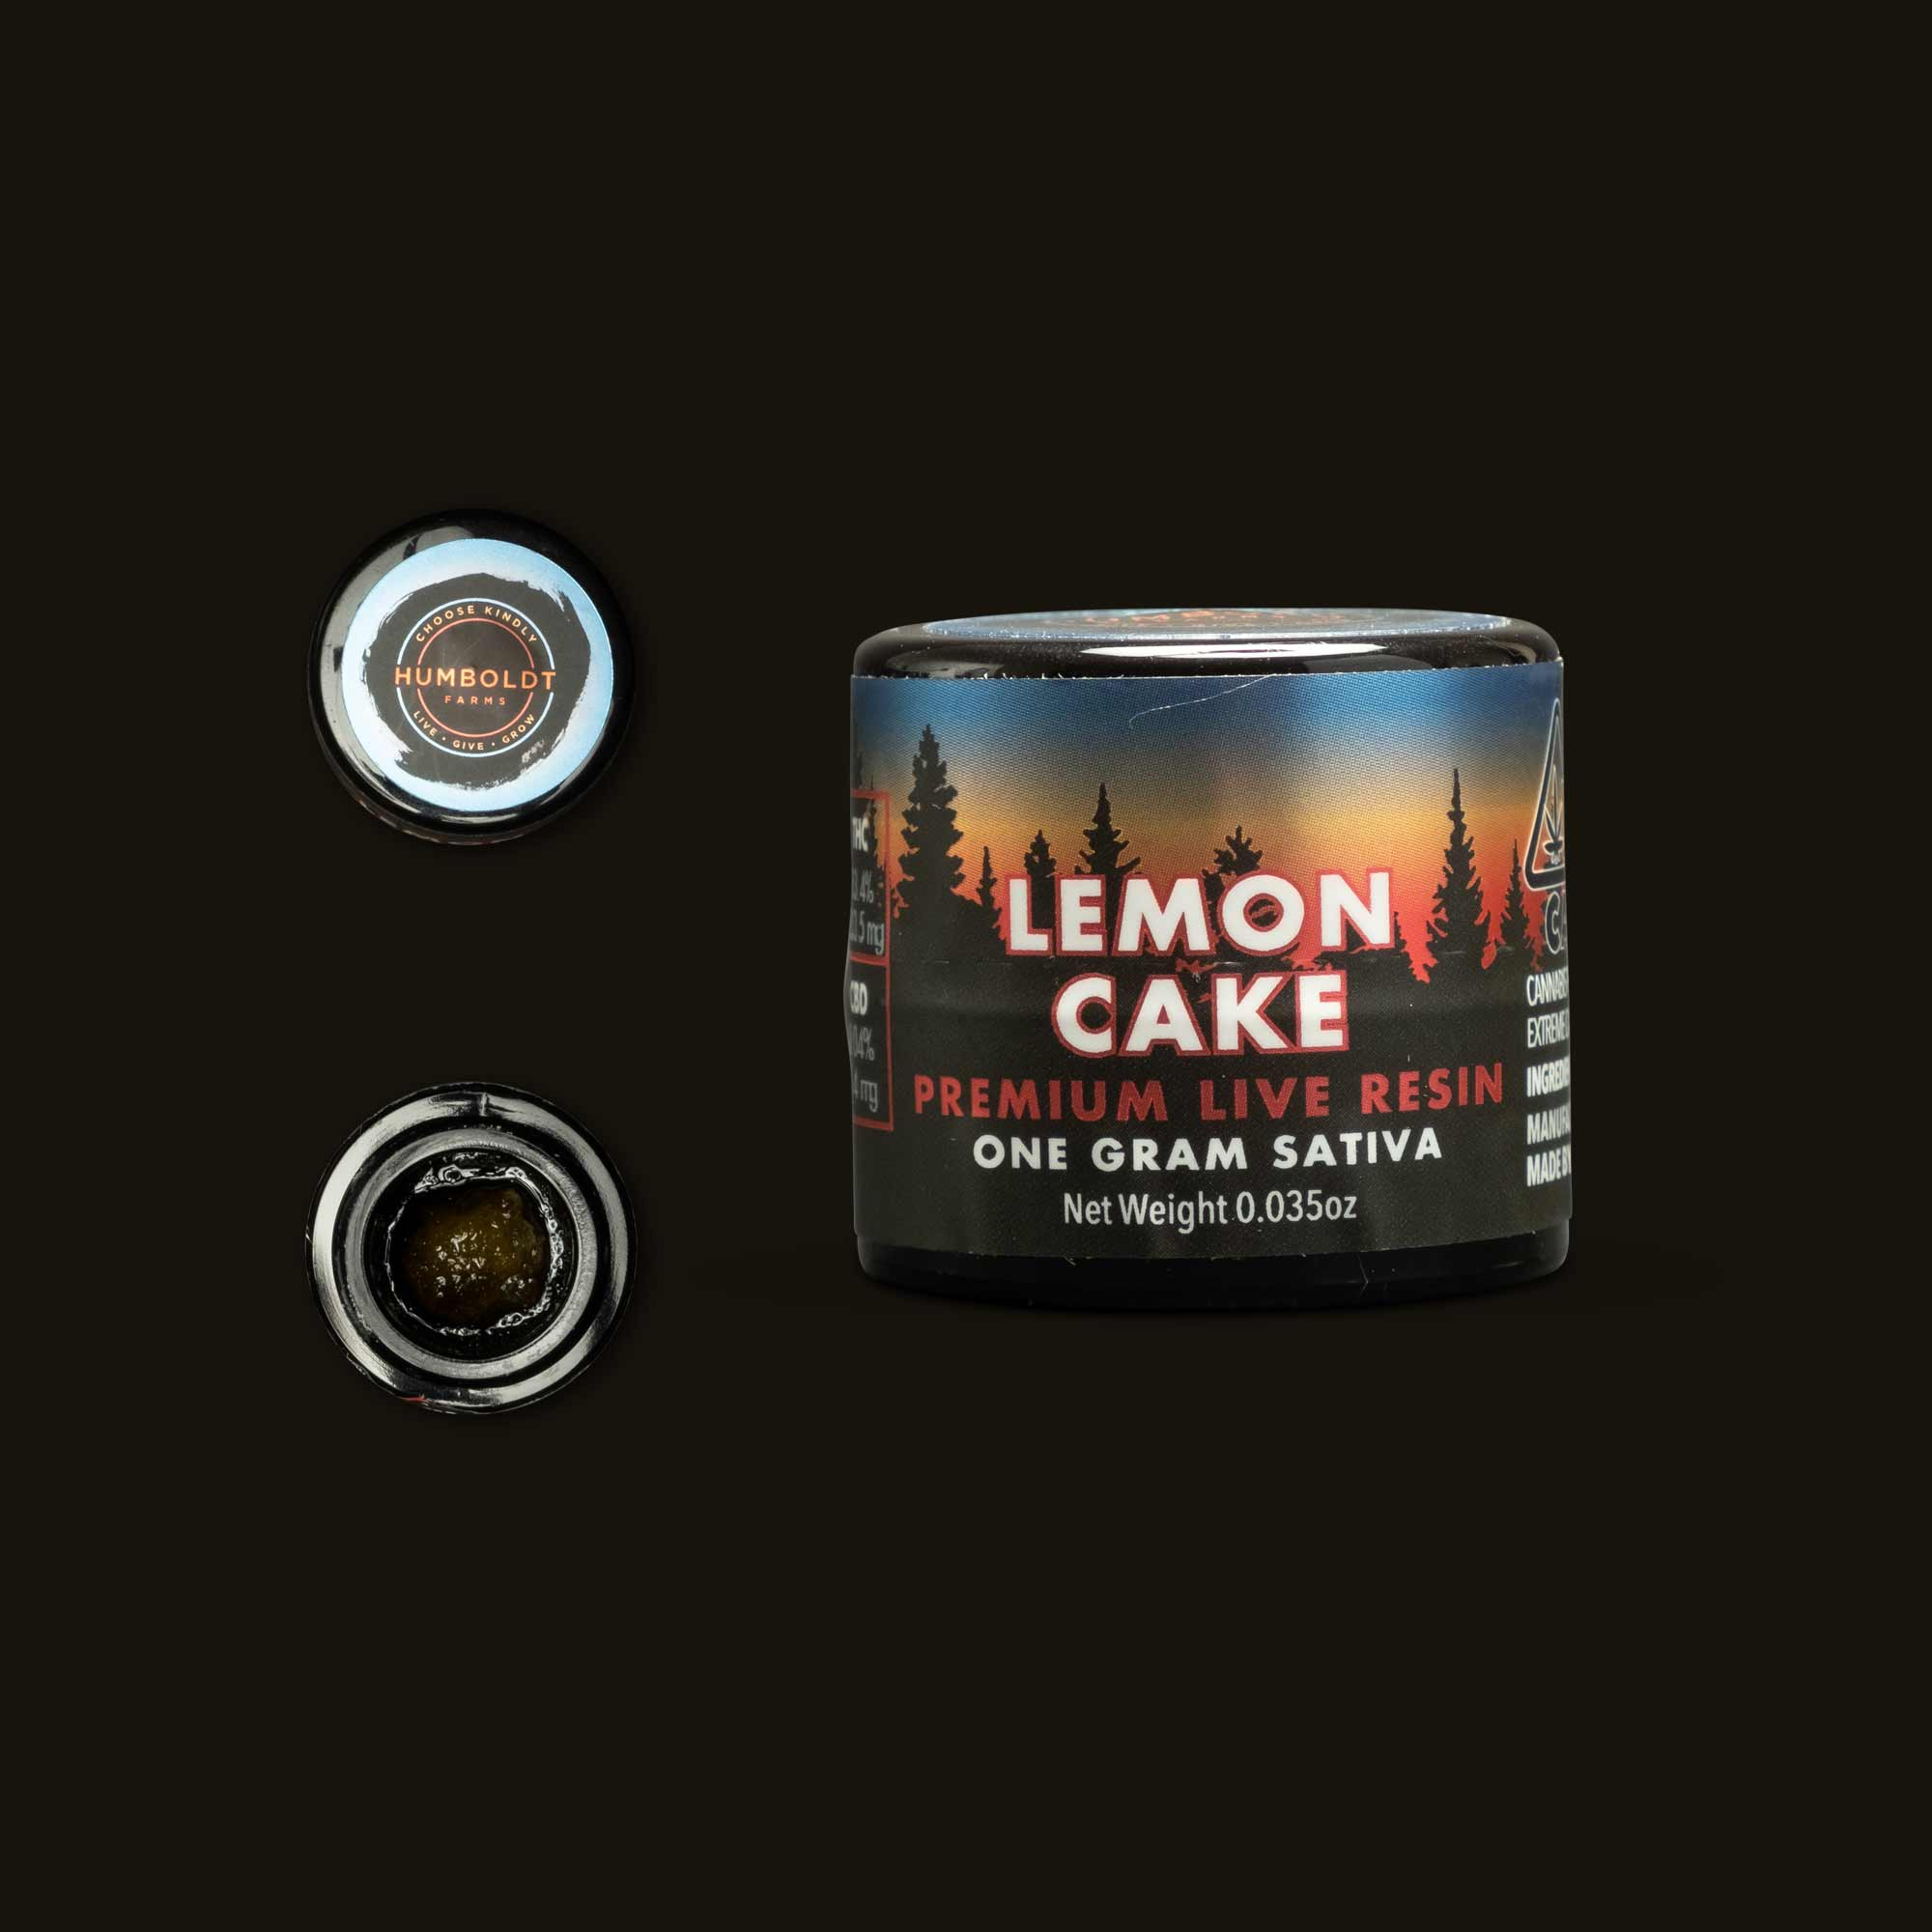 Humboldt Farms Lemon Cake Live Resin